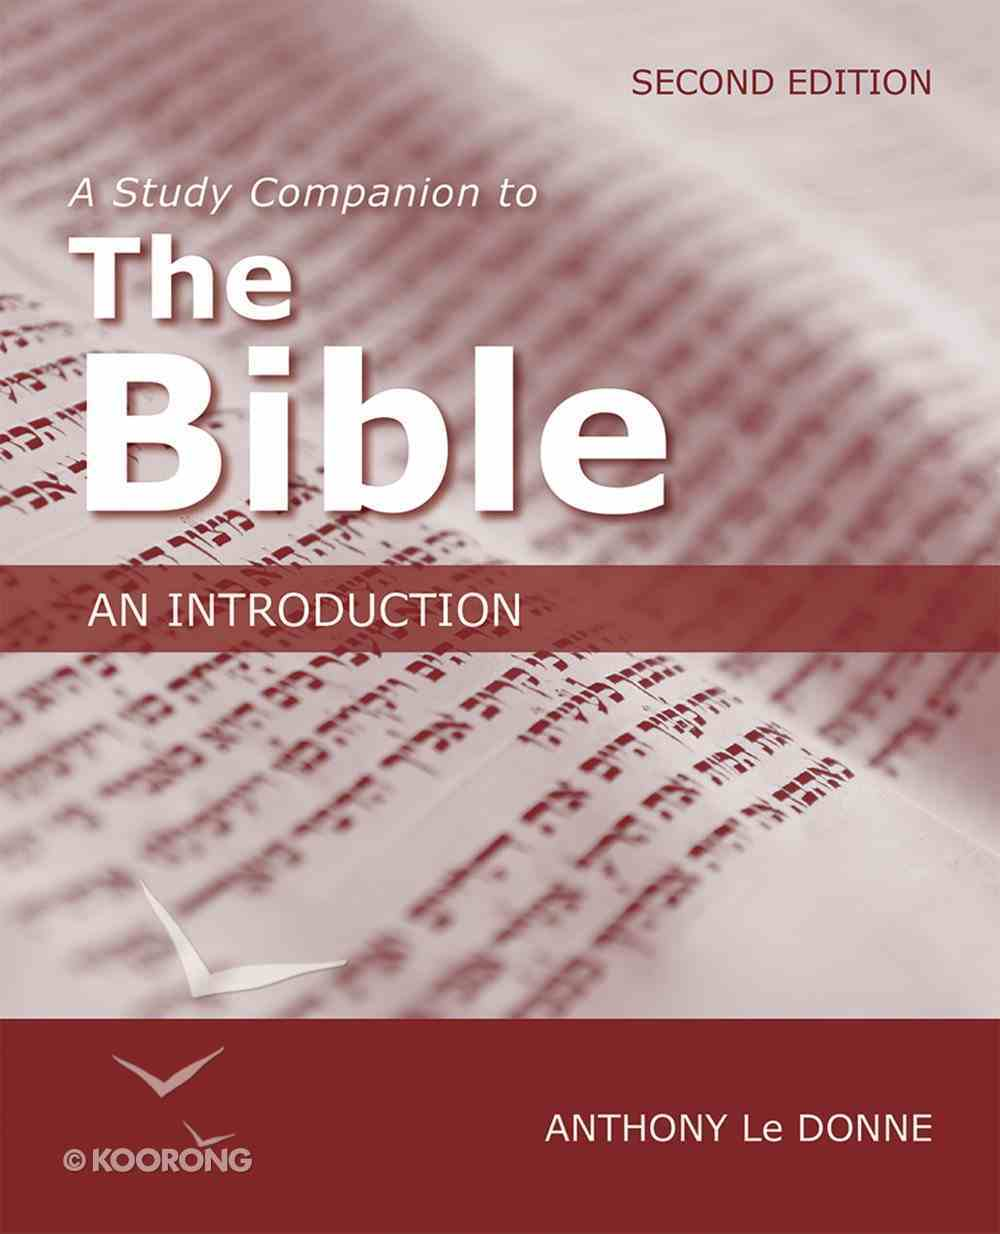 A Study Companion to the Bible eBook